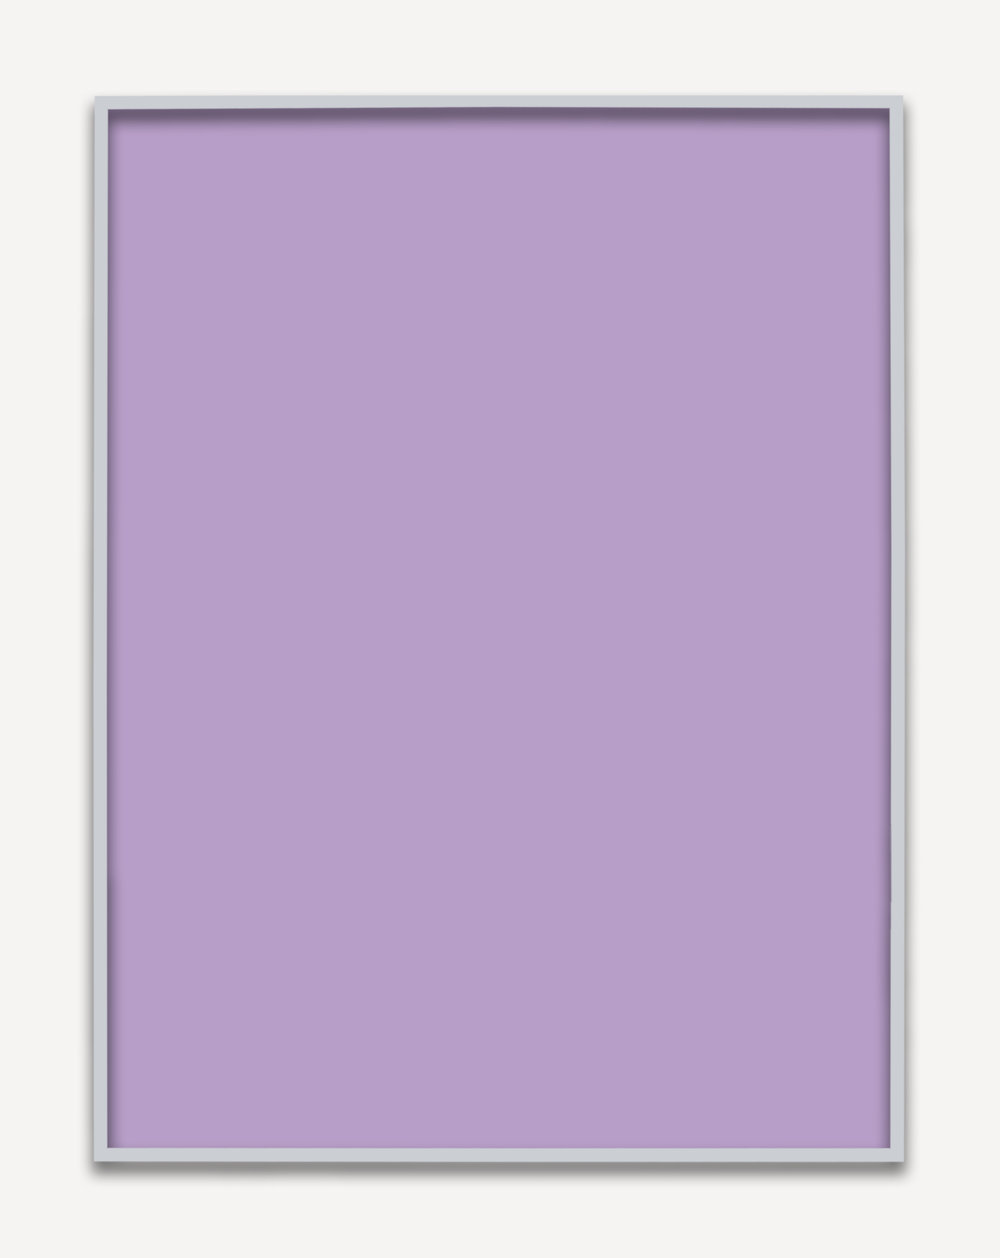 Untitled (Purple Monochrome 03), 2015 unique chromogenic prints 153,5 x 123,5 cm - 60 3/8 x 48 5/8 inches (framed)